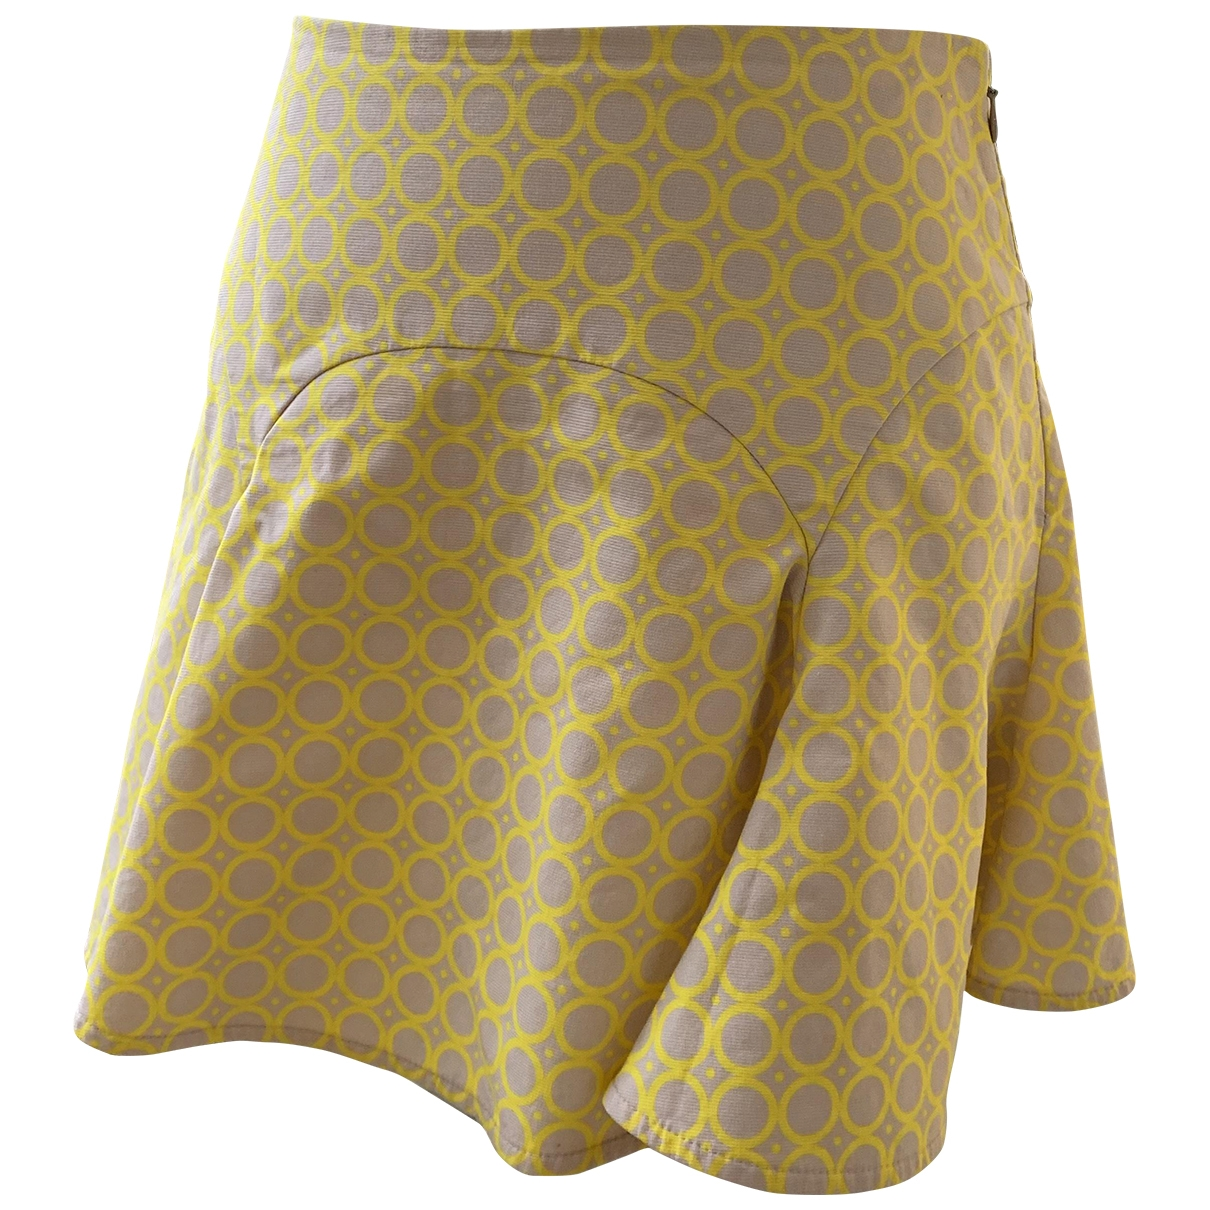 Patrizia Pepe \N Yellow Cotton skirt for Women 36 IT